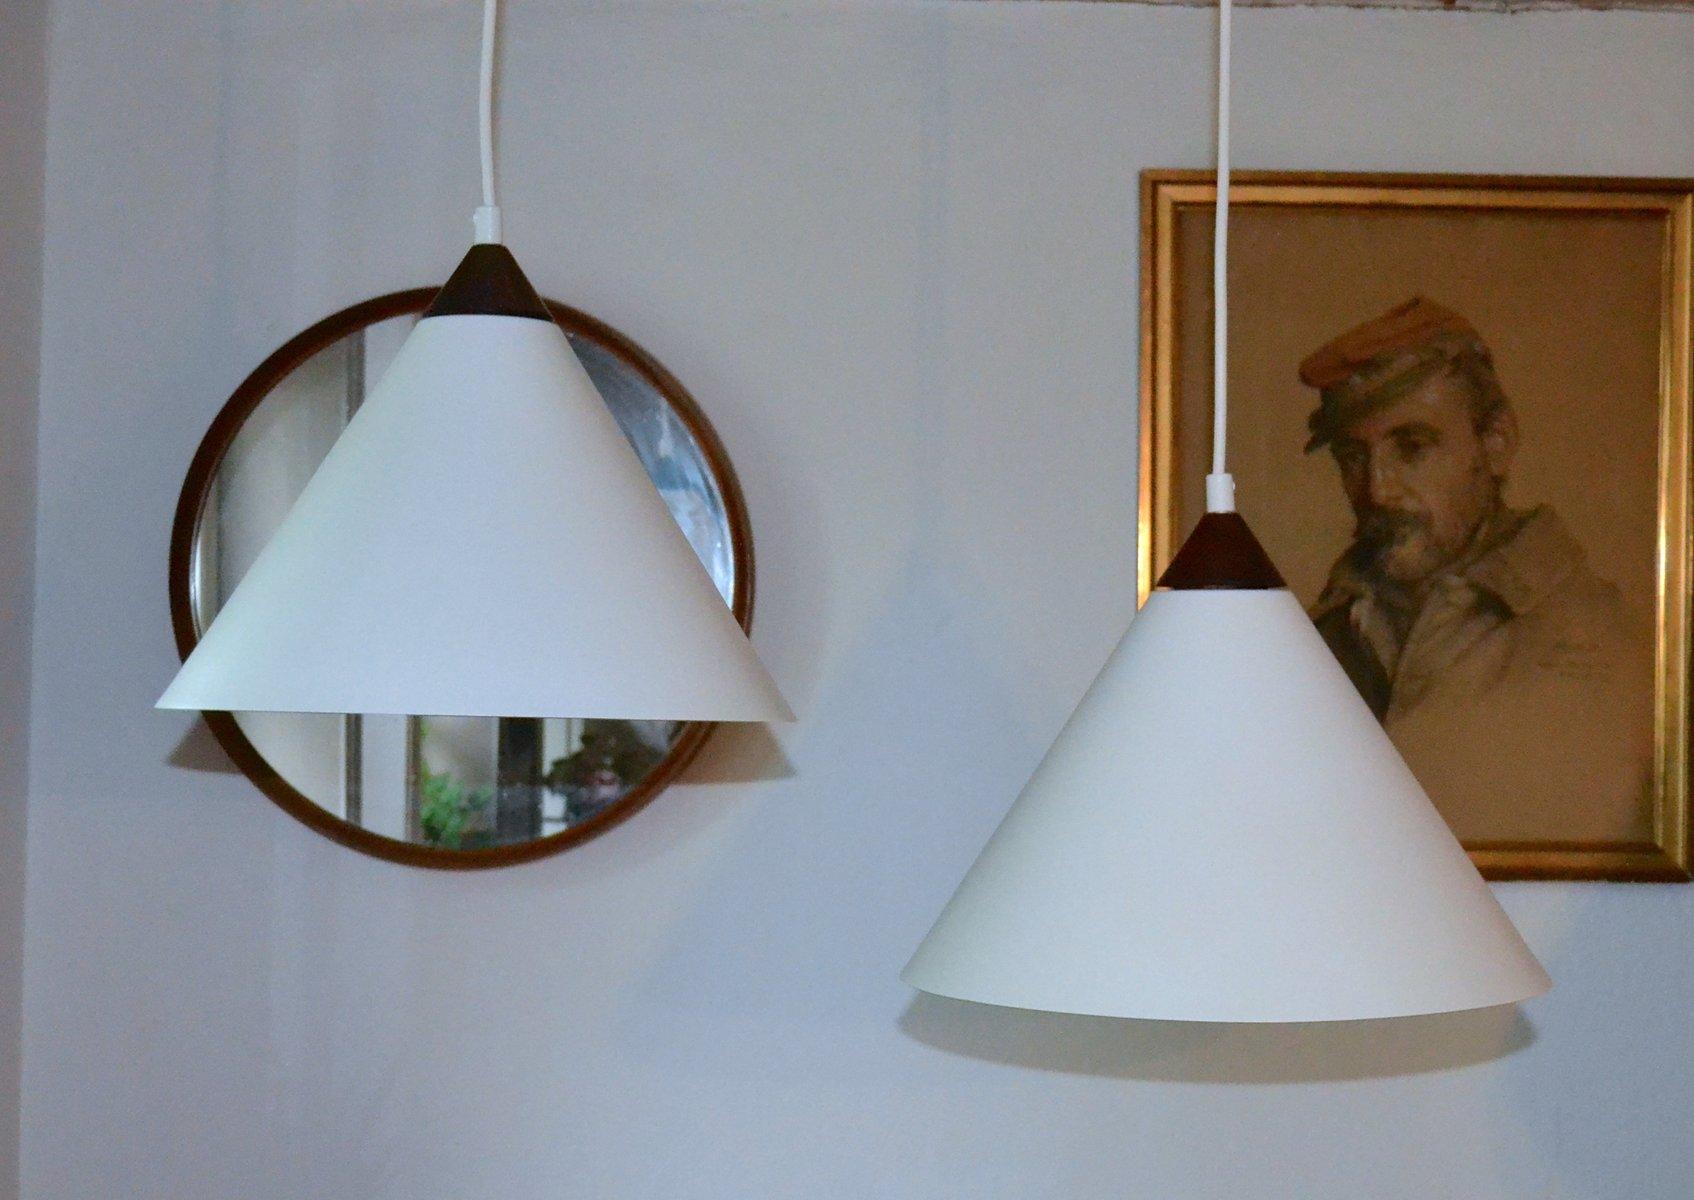 model 580 pendants by uno & Östen kristiansson for luxus, set of 2 ... - Luxus Raumausstattung Shop